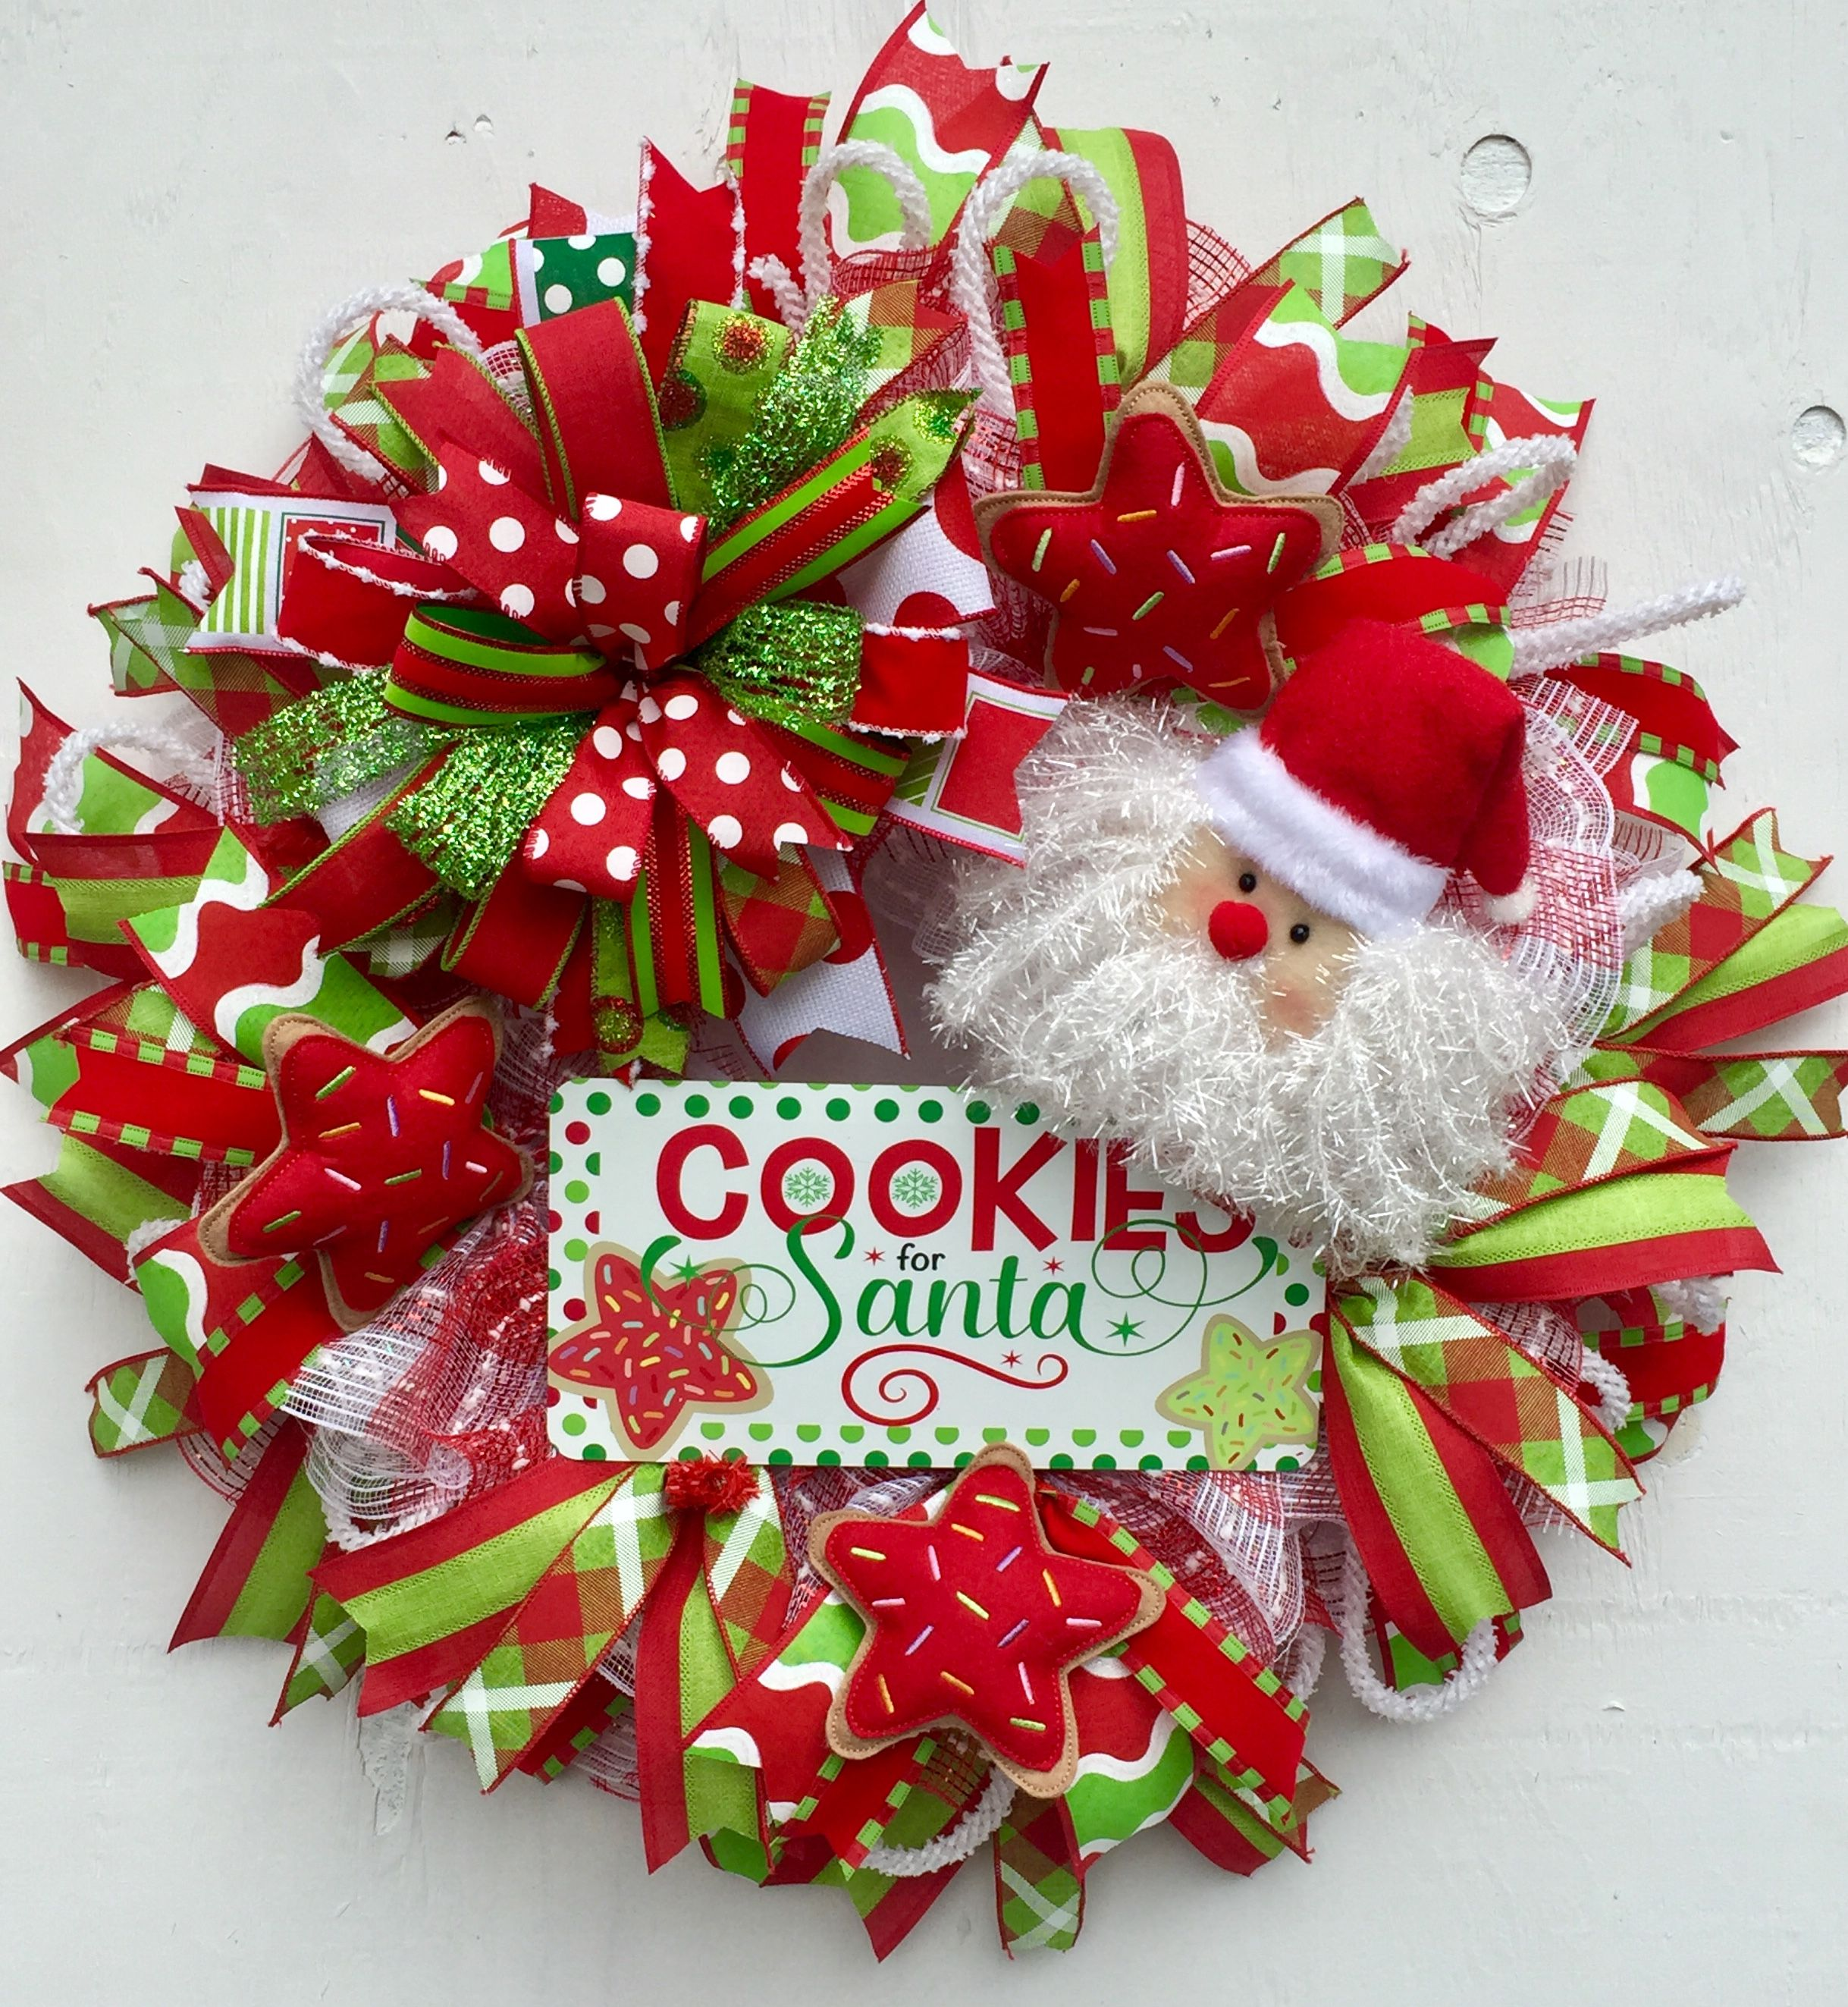 Santa Wreath Whimsical Wreath Cookies For Santa Christmas Wreath